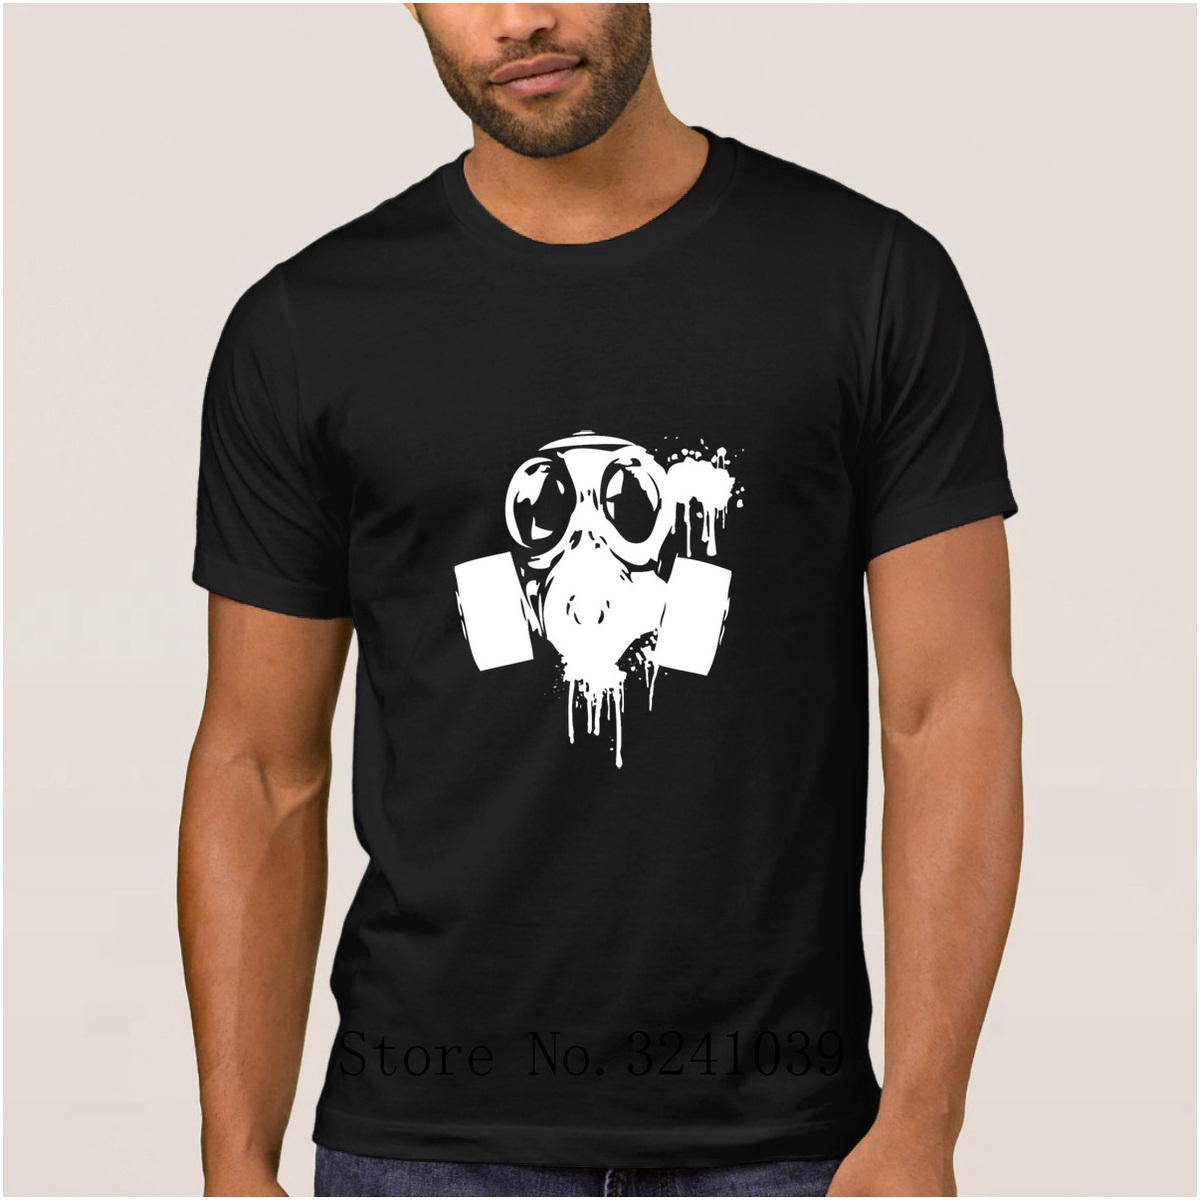 La Maxpa Designing Latest Gas Masks Graphics men t shirt 2017 Interesting mens t-shirt Leisure men tshirt Short Sleeve Unisex